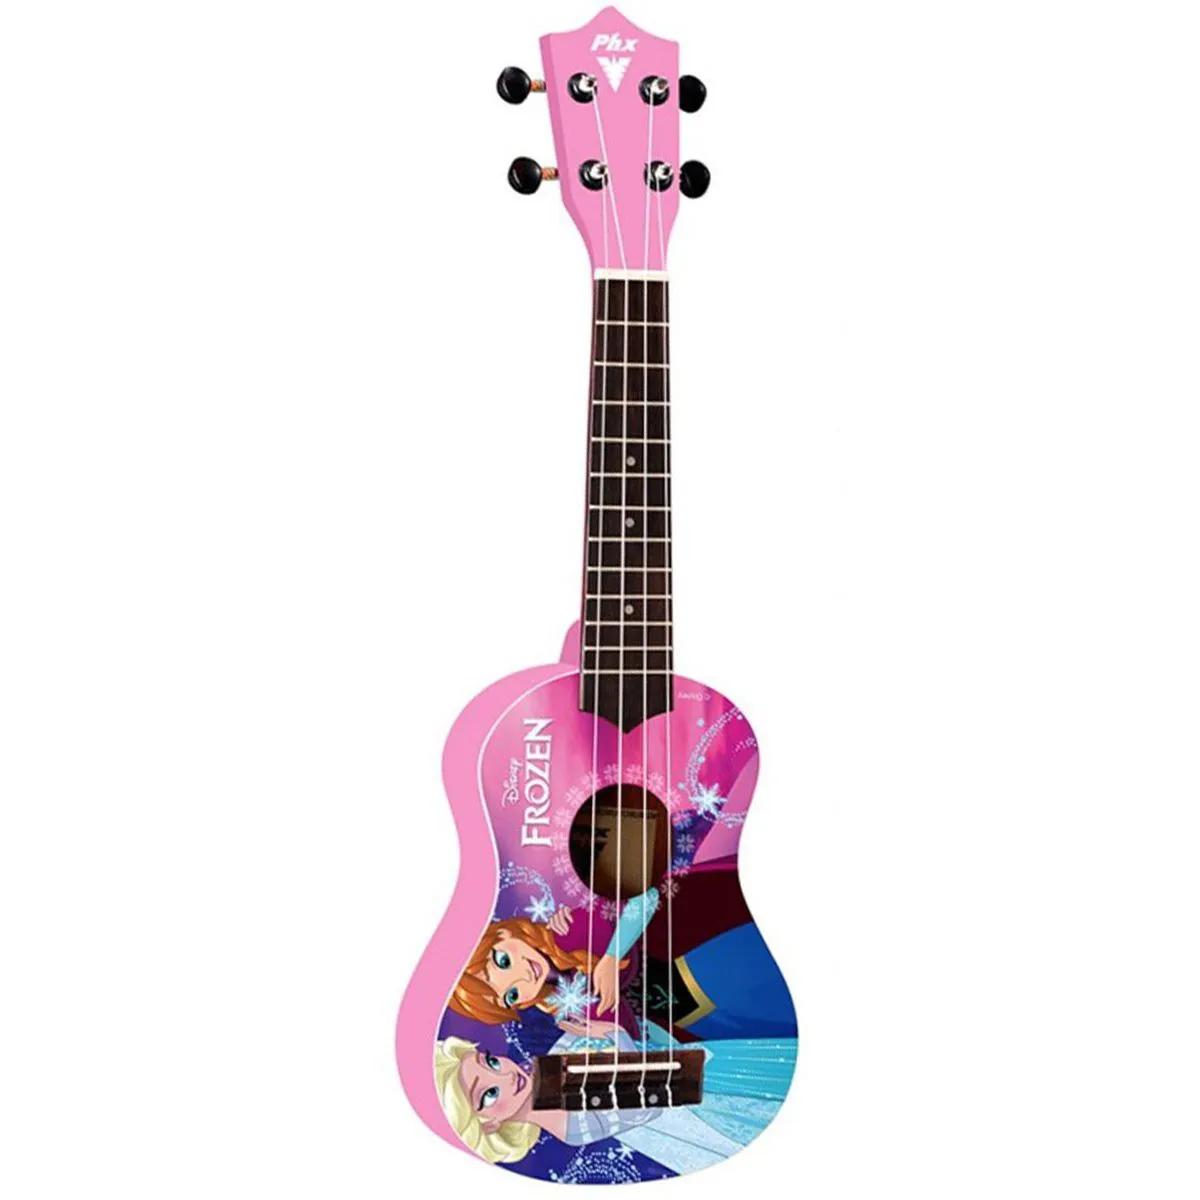 Ukulele Acústico PHX UKP-F2 Soprano 21 Frozen Pink com Capa